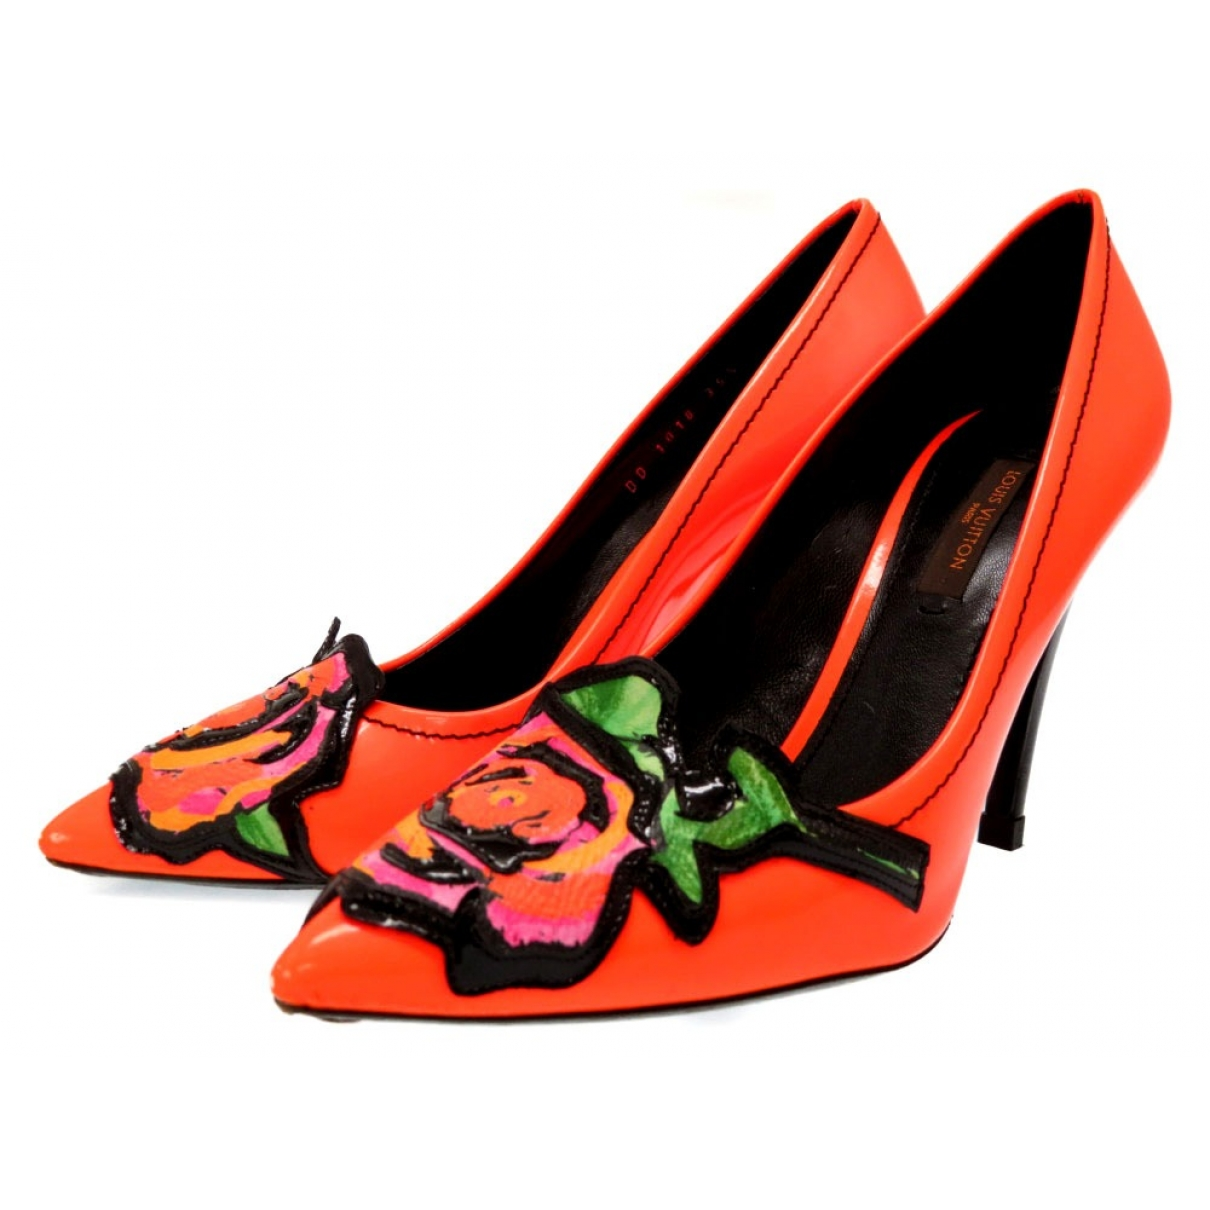 Louis Vuitton \N Orange Patent leather Heels for Women 35.5 EU